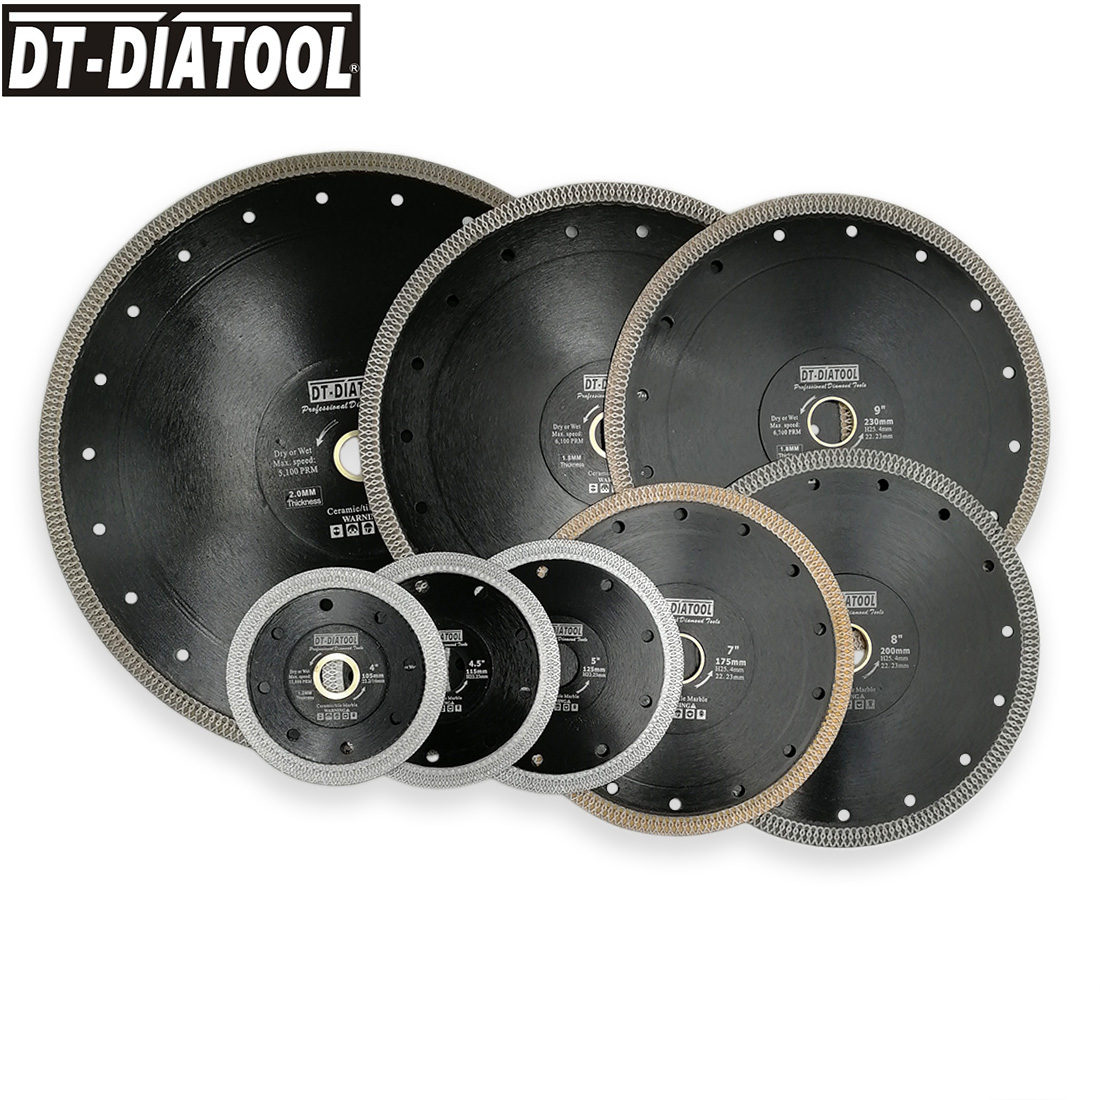 DT-DIATOOL 1pc Dia 4/4.5/5/7/8/9/10/12 Hot-pressed Diamond Cutting Disc X Mesh Turbo rim segment Saw Blades for CeramicDT-DIATOOL 1pc Dia 4/4.5/5/7/8/9/10/12 Hot-pressed Diamond Cutting Disc X Mesh Turbo rim segment Saw Blades for Ceramic